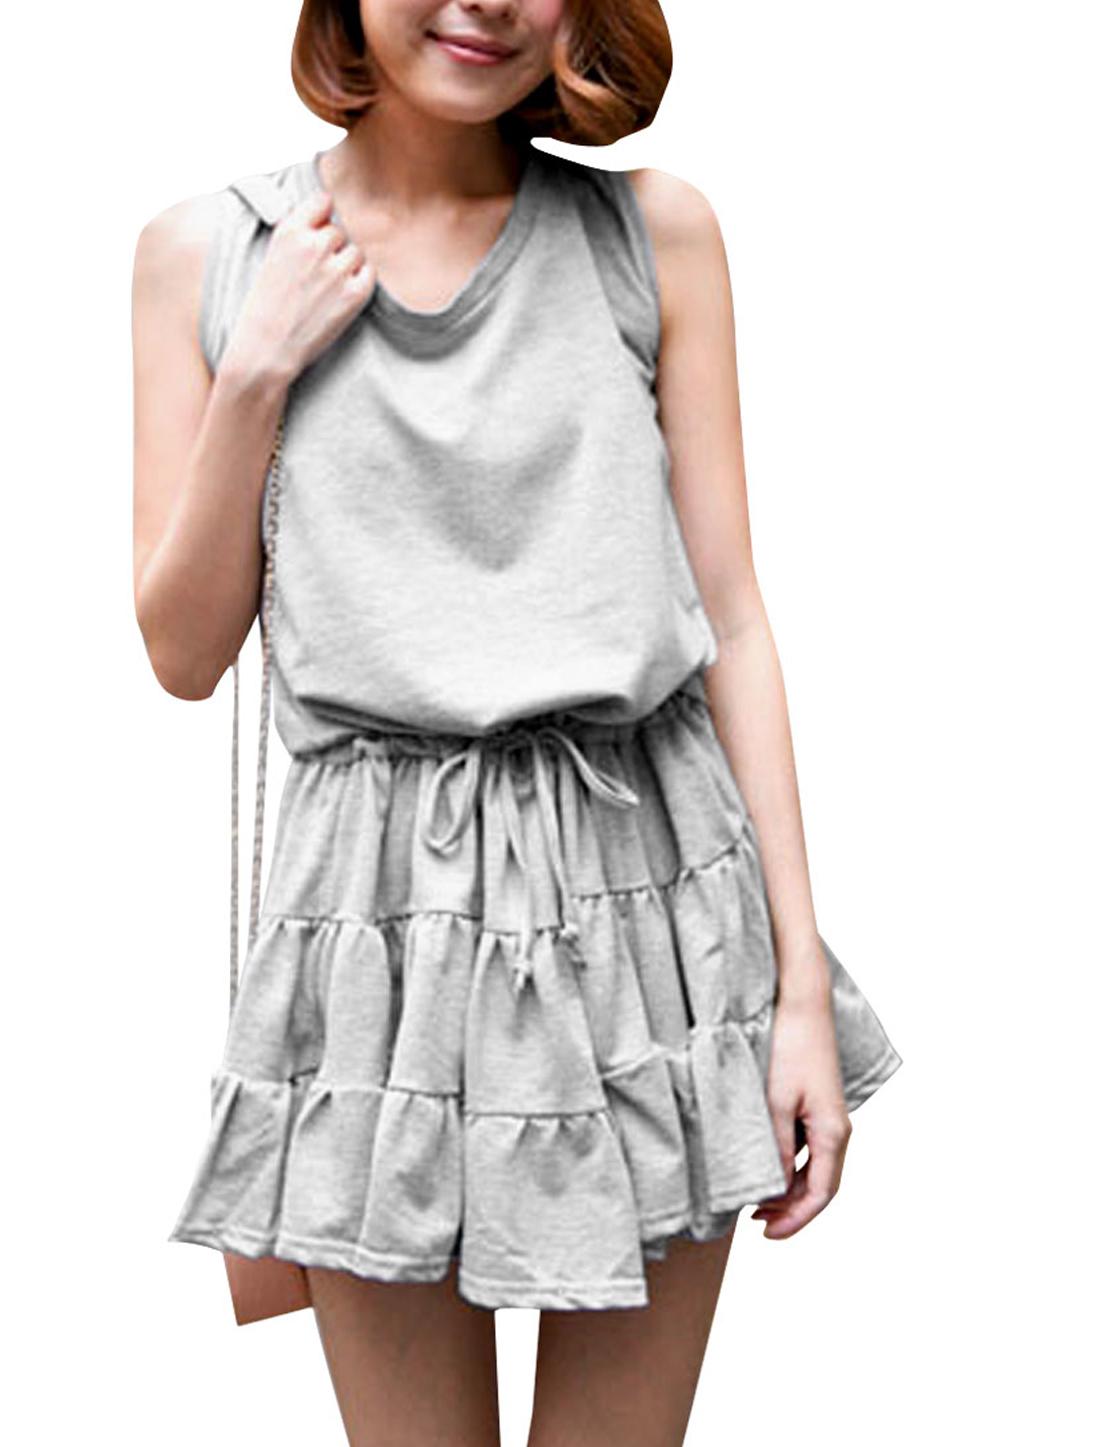 Women Sleeveless Pullover Stretchy Dress Light Gray XS